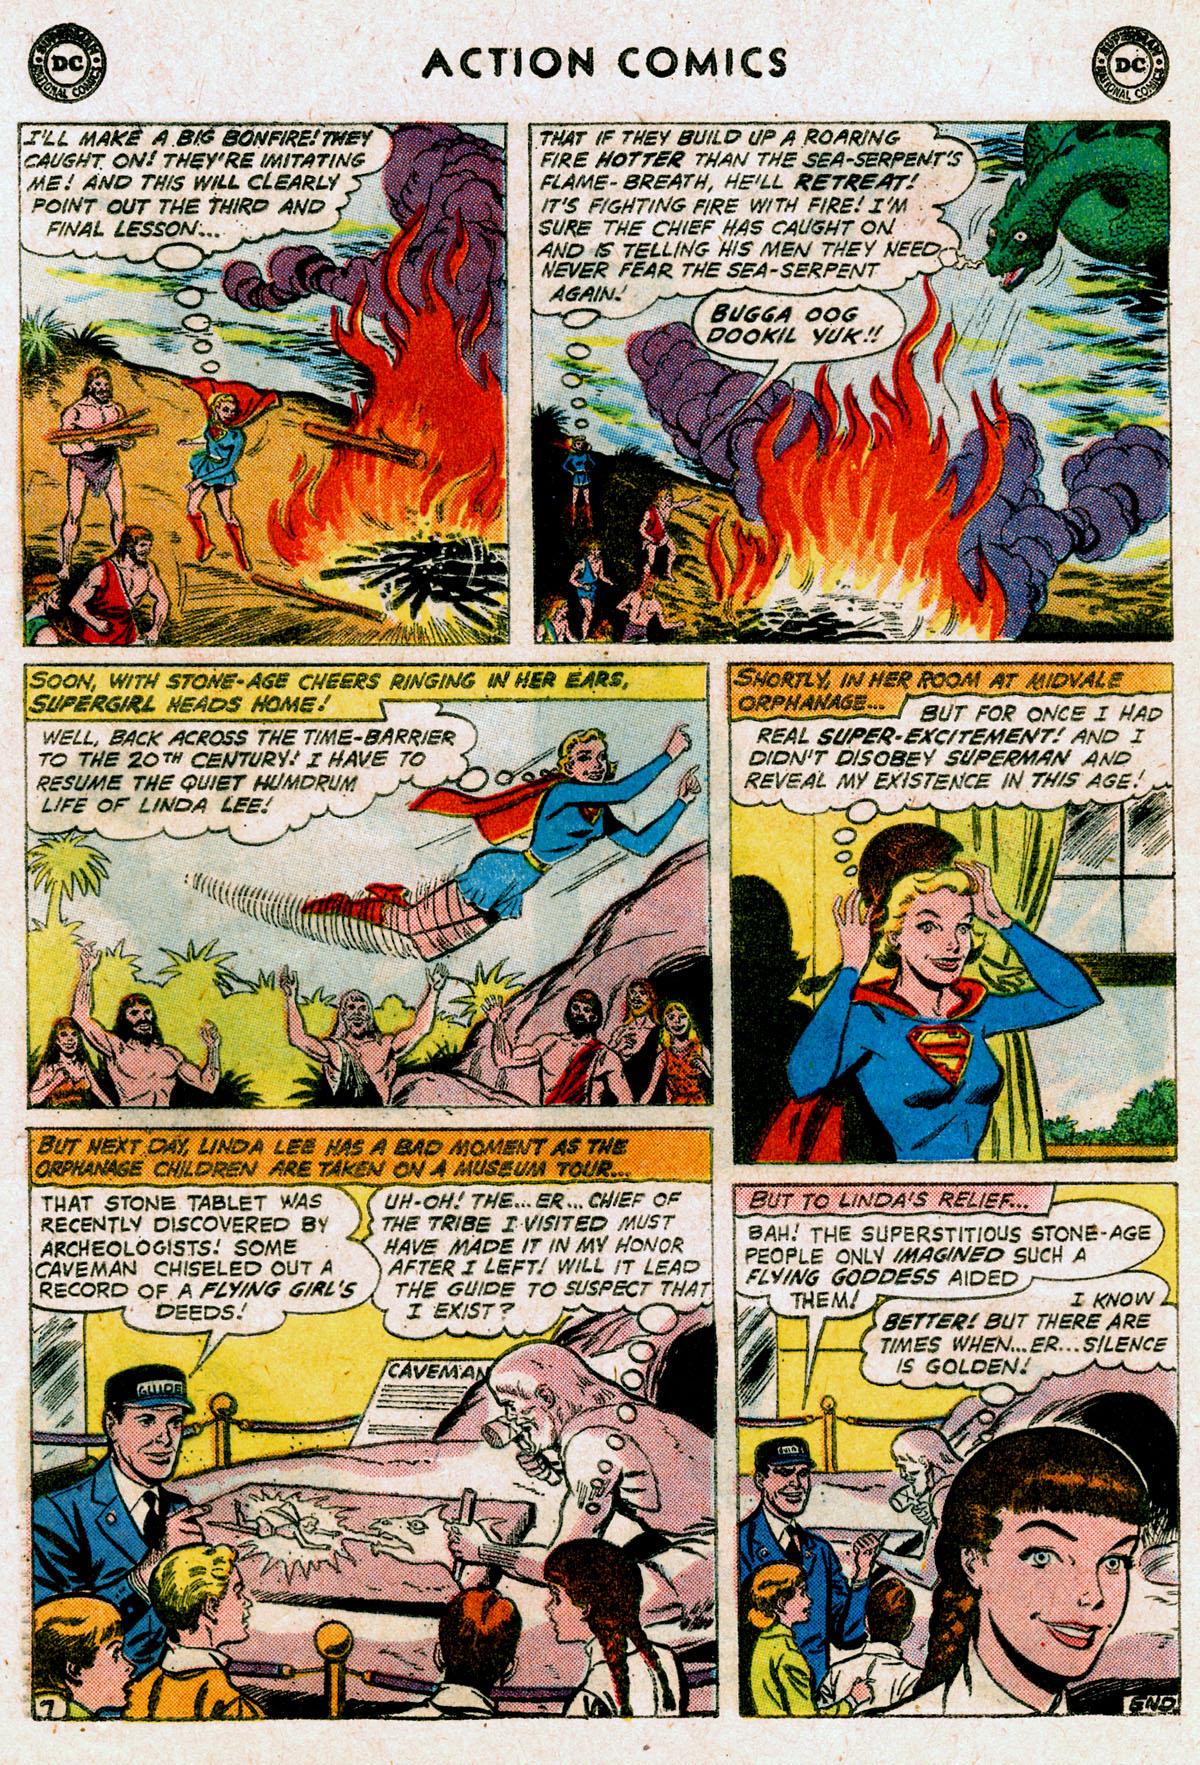 Action Comics (1938) 259 Page 31